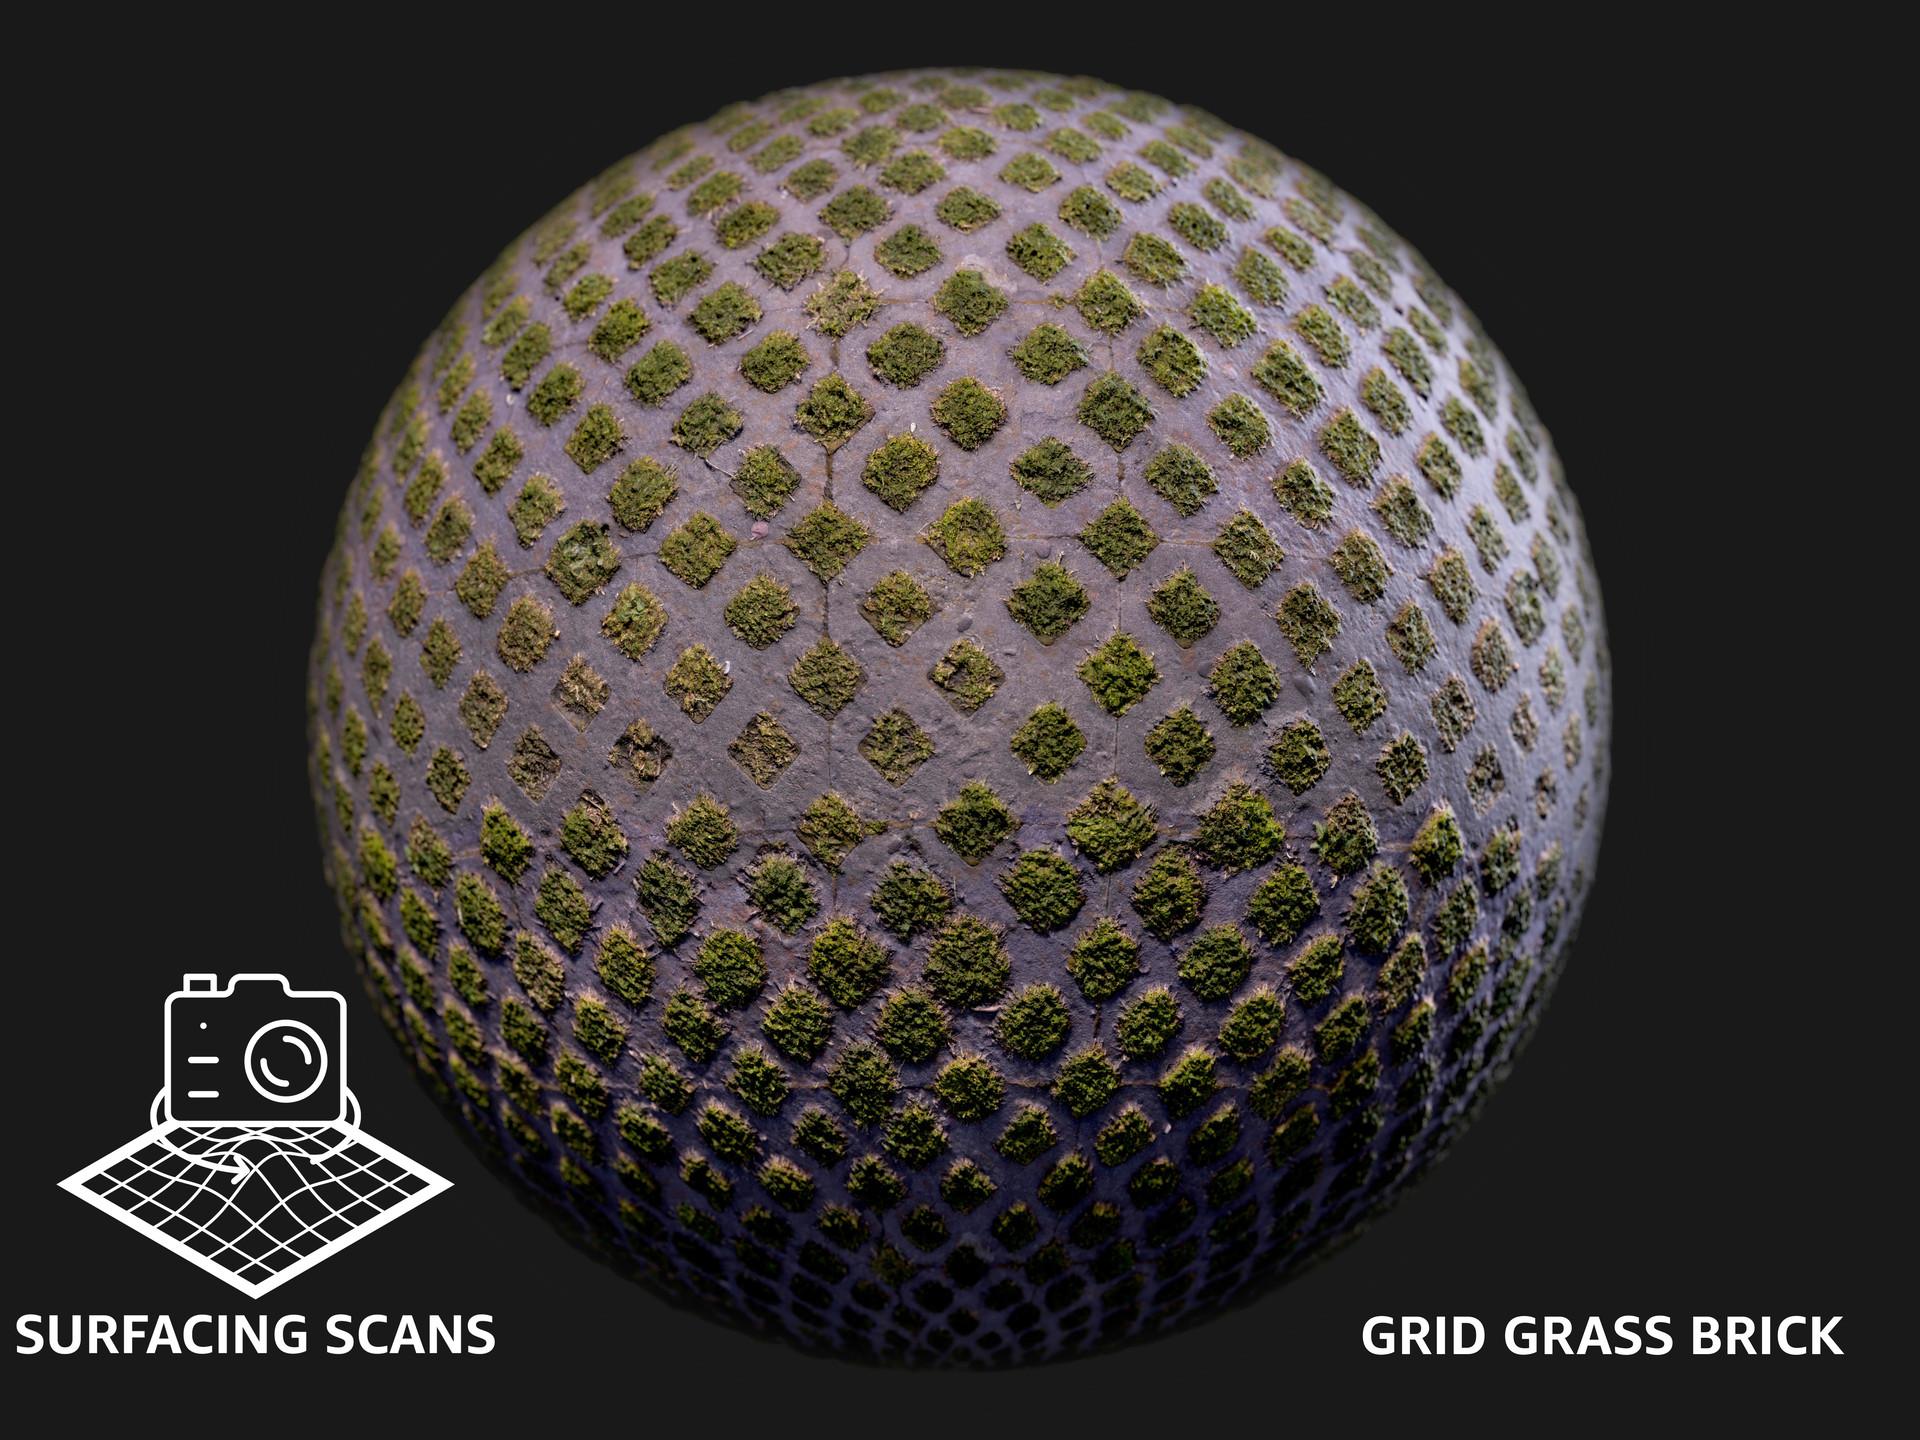 Martin pietras grid grass brick 01